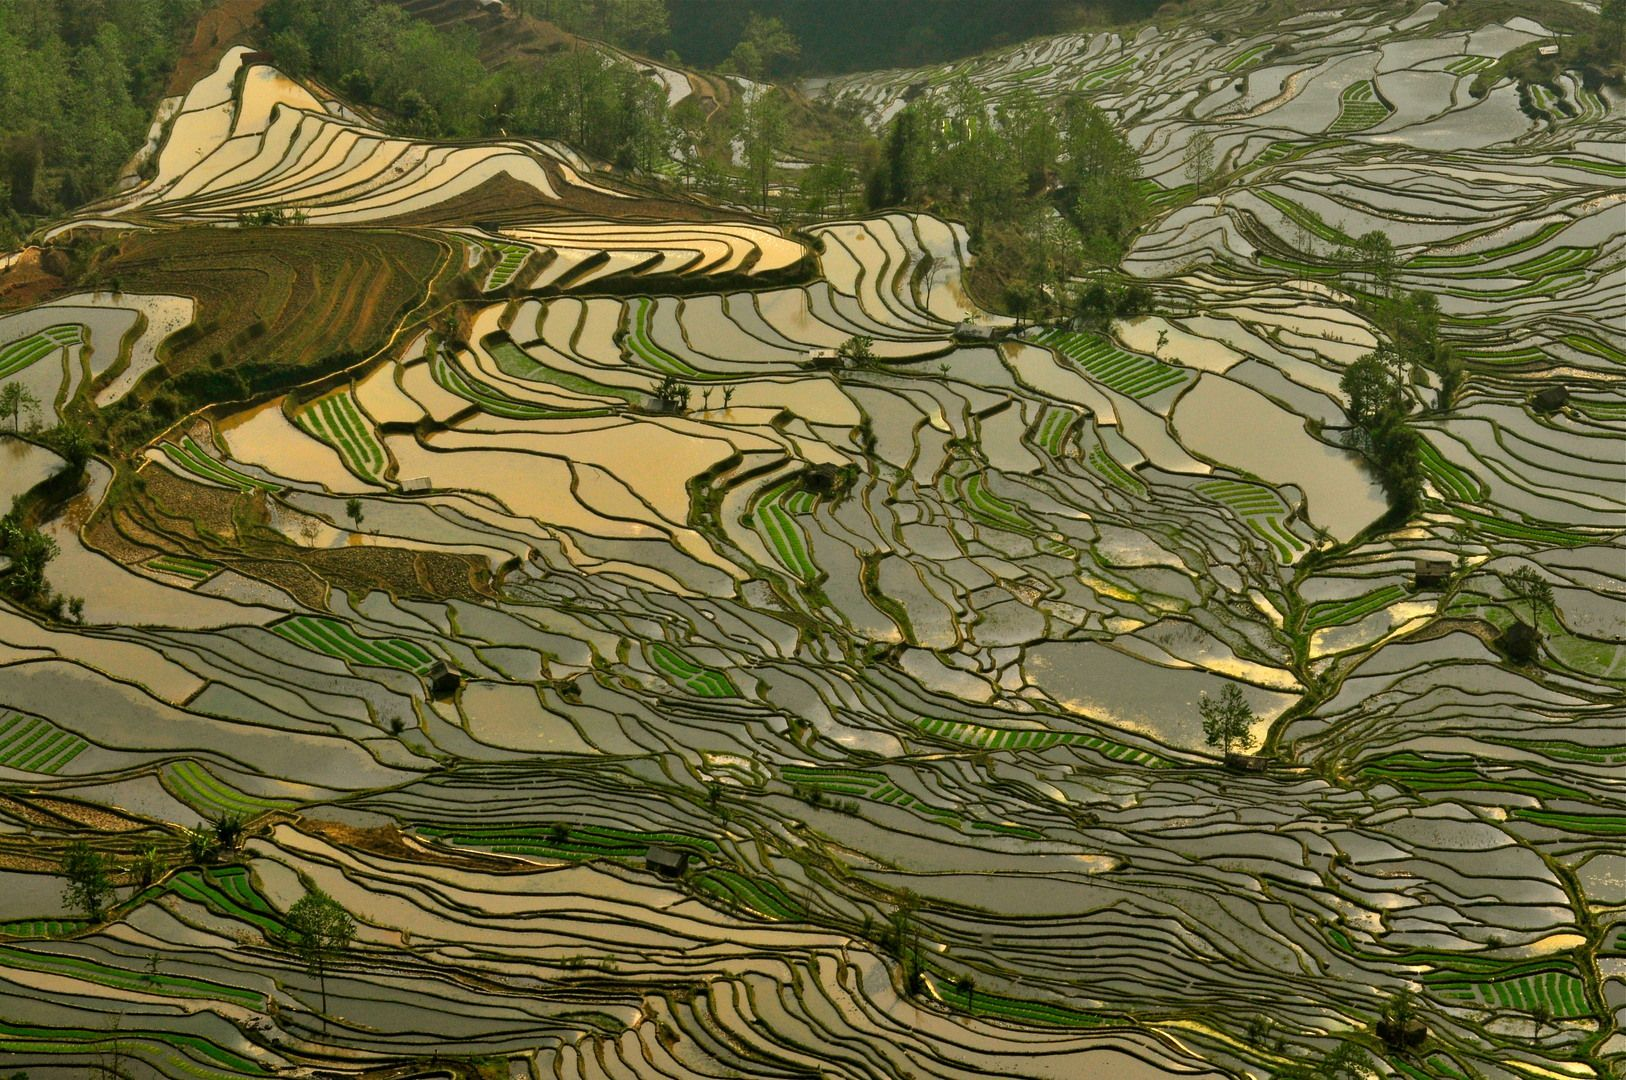 http://images.cdn.fotopedia.com/f68bcep7103n-pz7clBDXbA0-hd.jpg